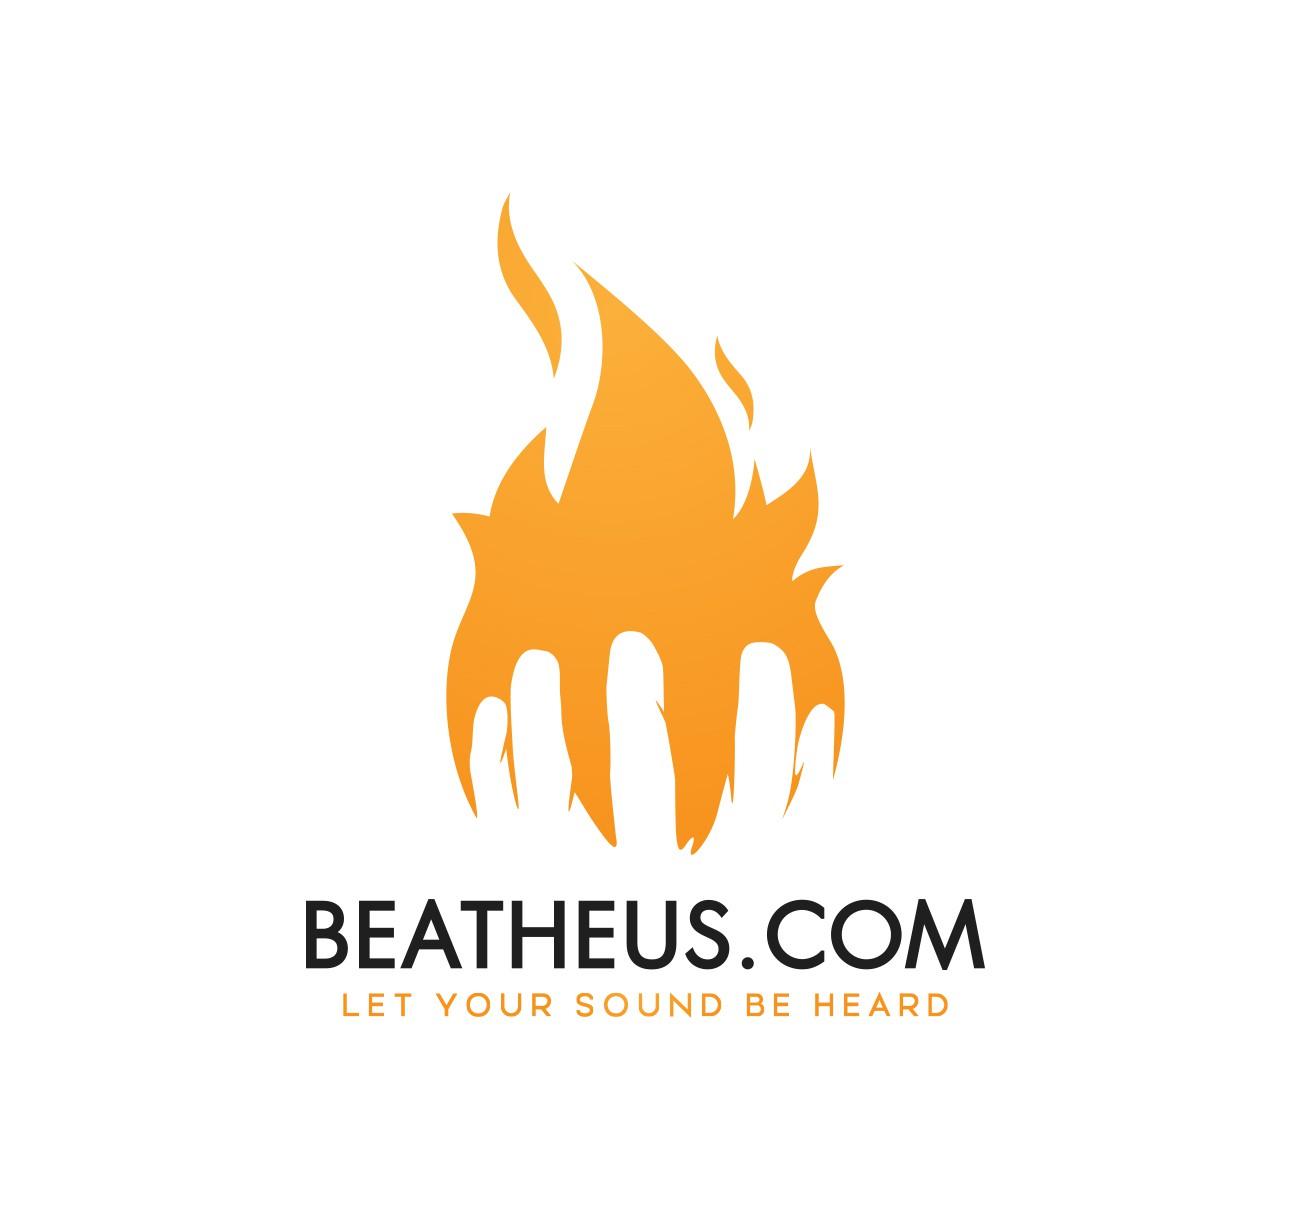 design a logo for an audio website